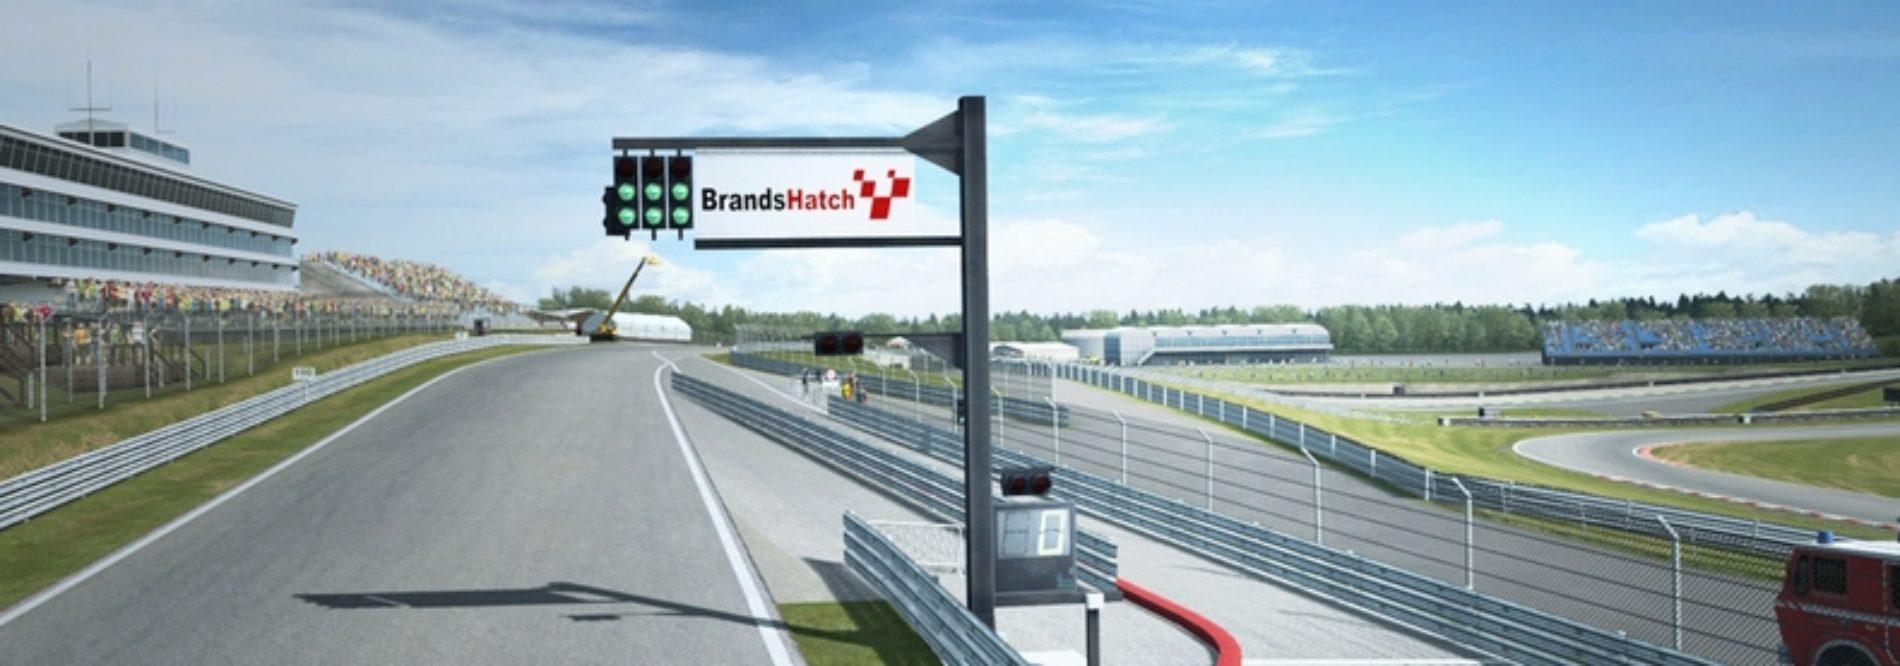 Previo | Brands Hatch | Comenzamos!